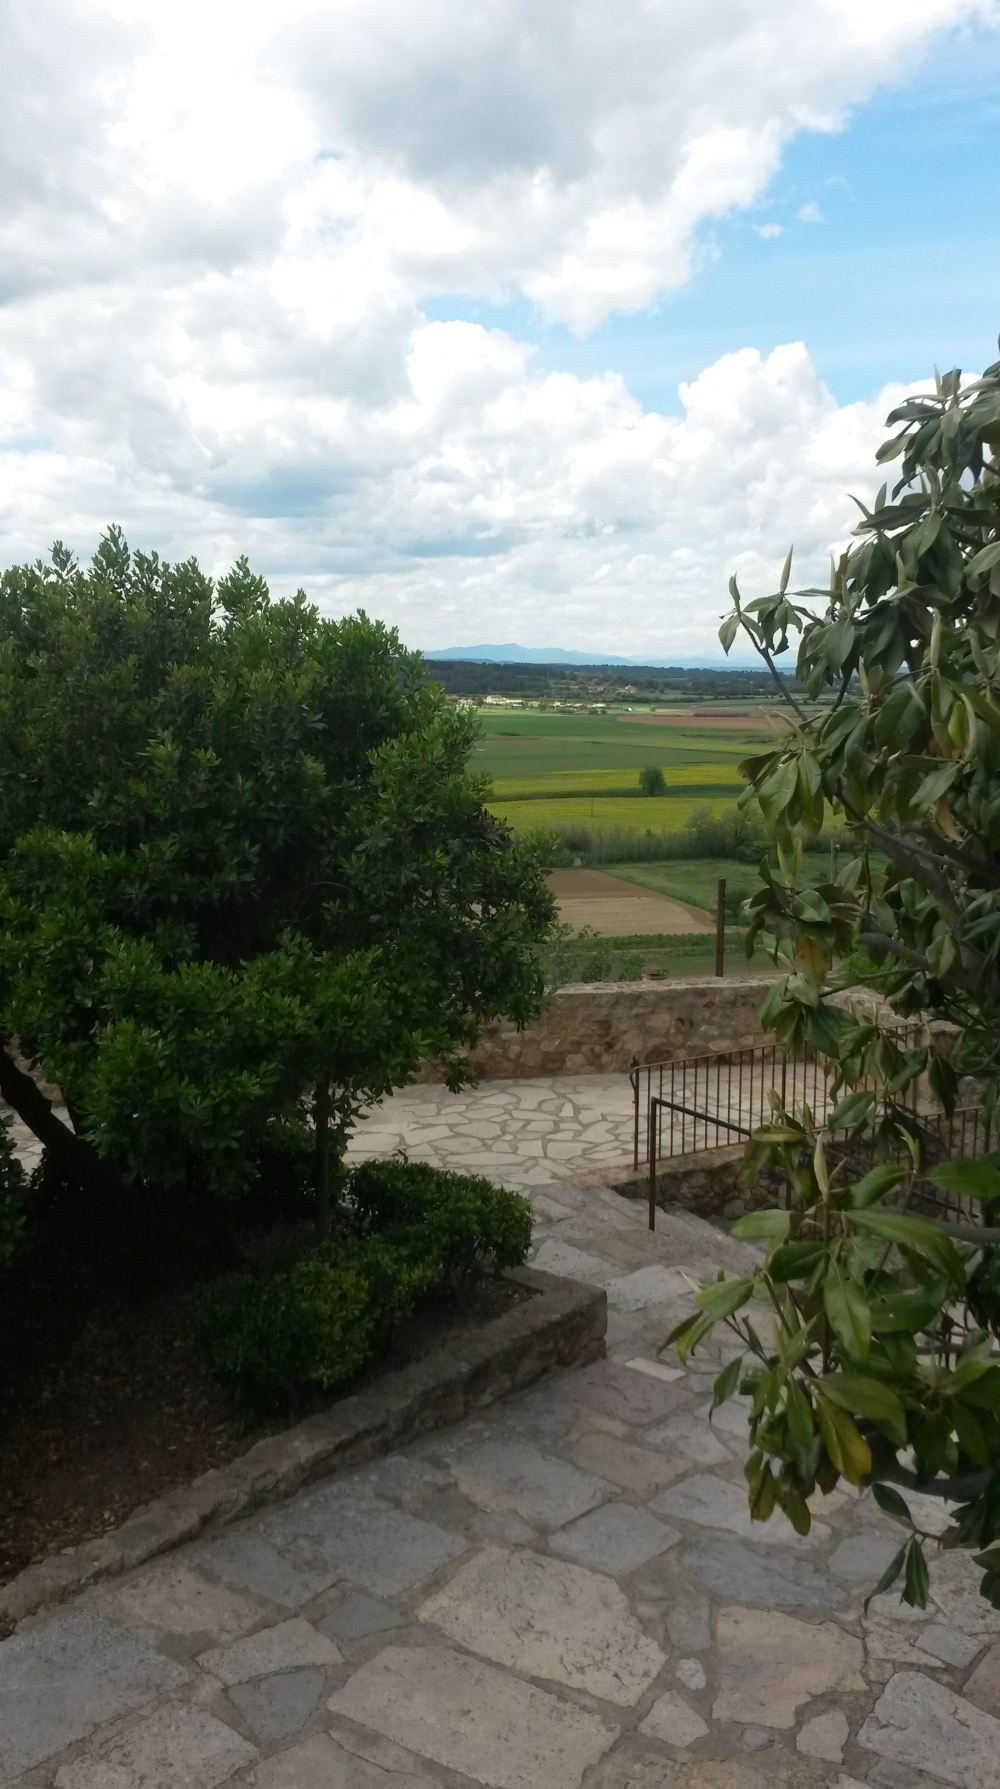 Groene omgeving rond het dorp Pals, Costa Brava, Spanje